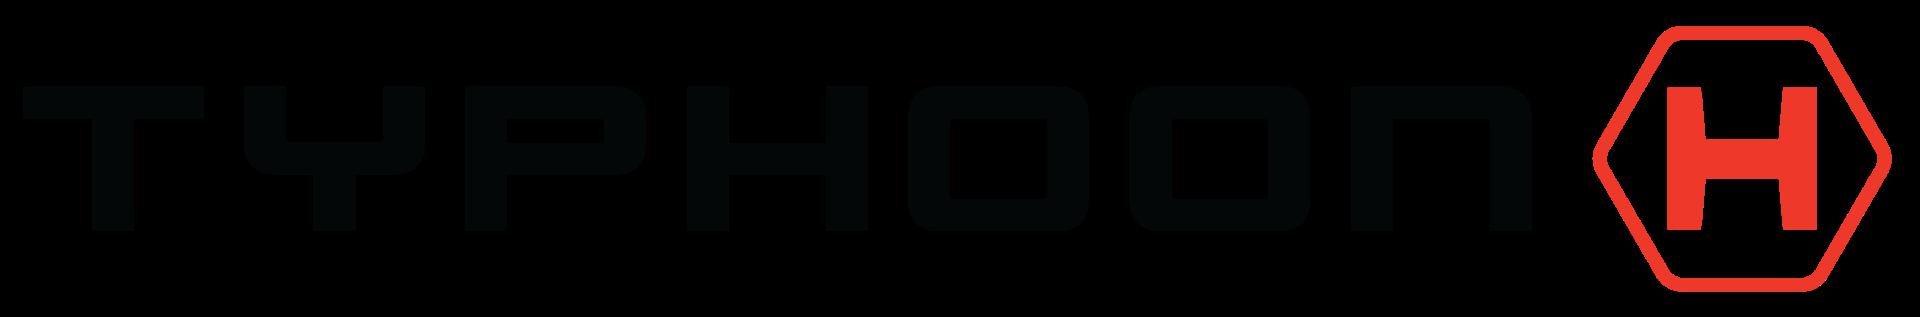 Typhoon-H-Logo